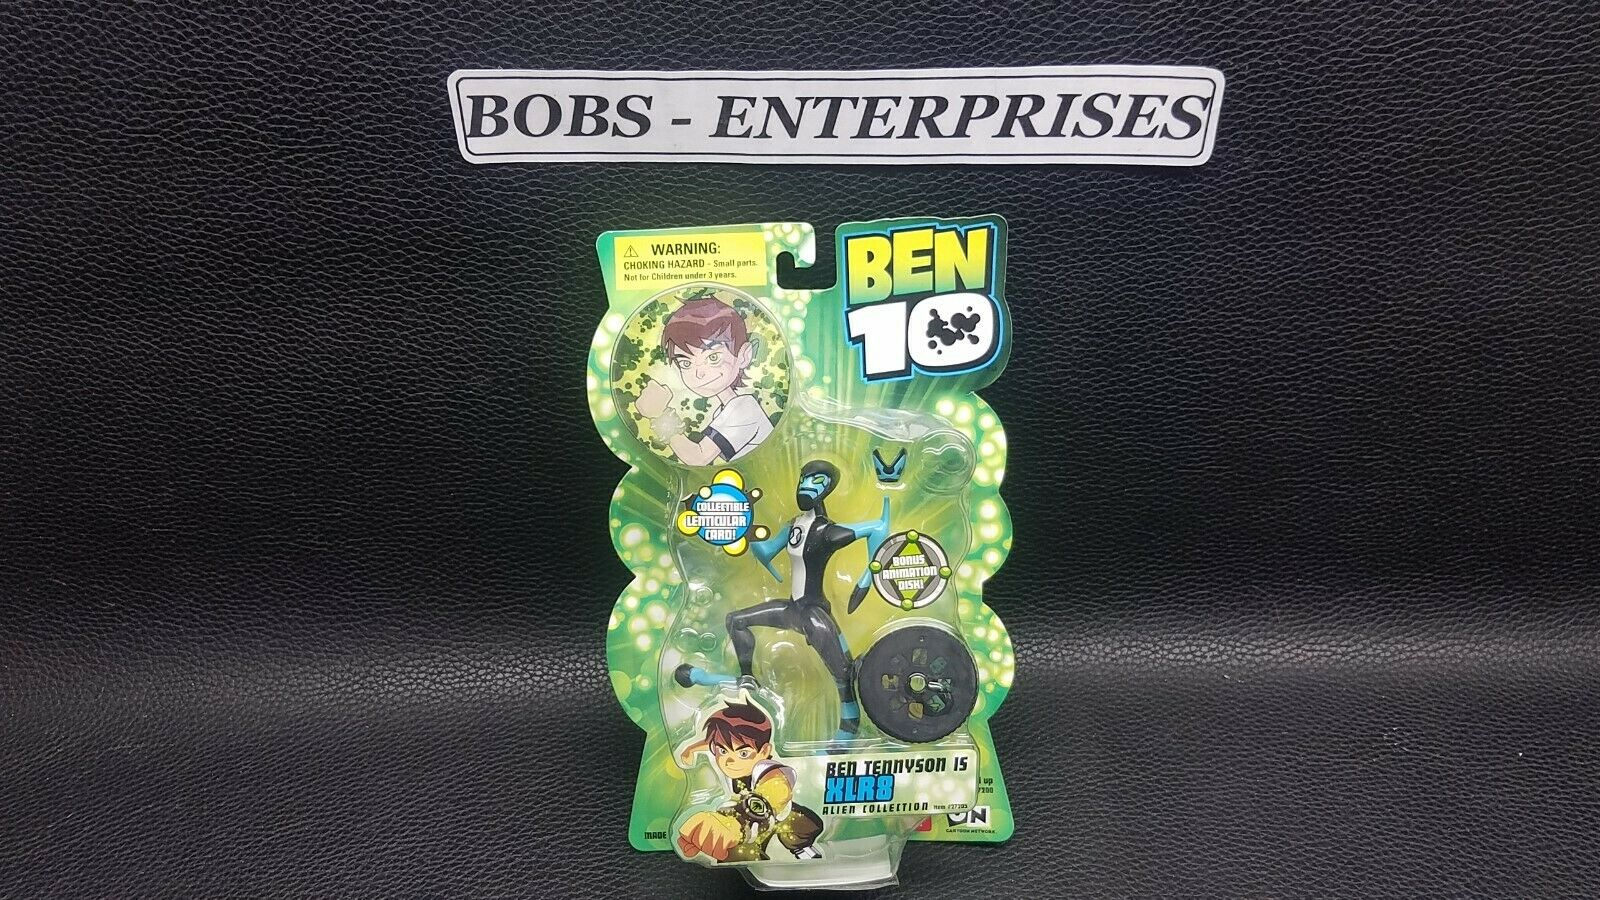 Ben 10 Alien samling Series 1 XLR8 Action Figur bt -65